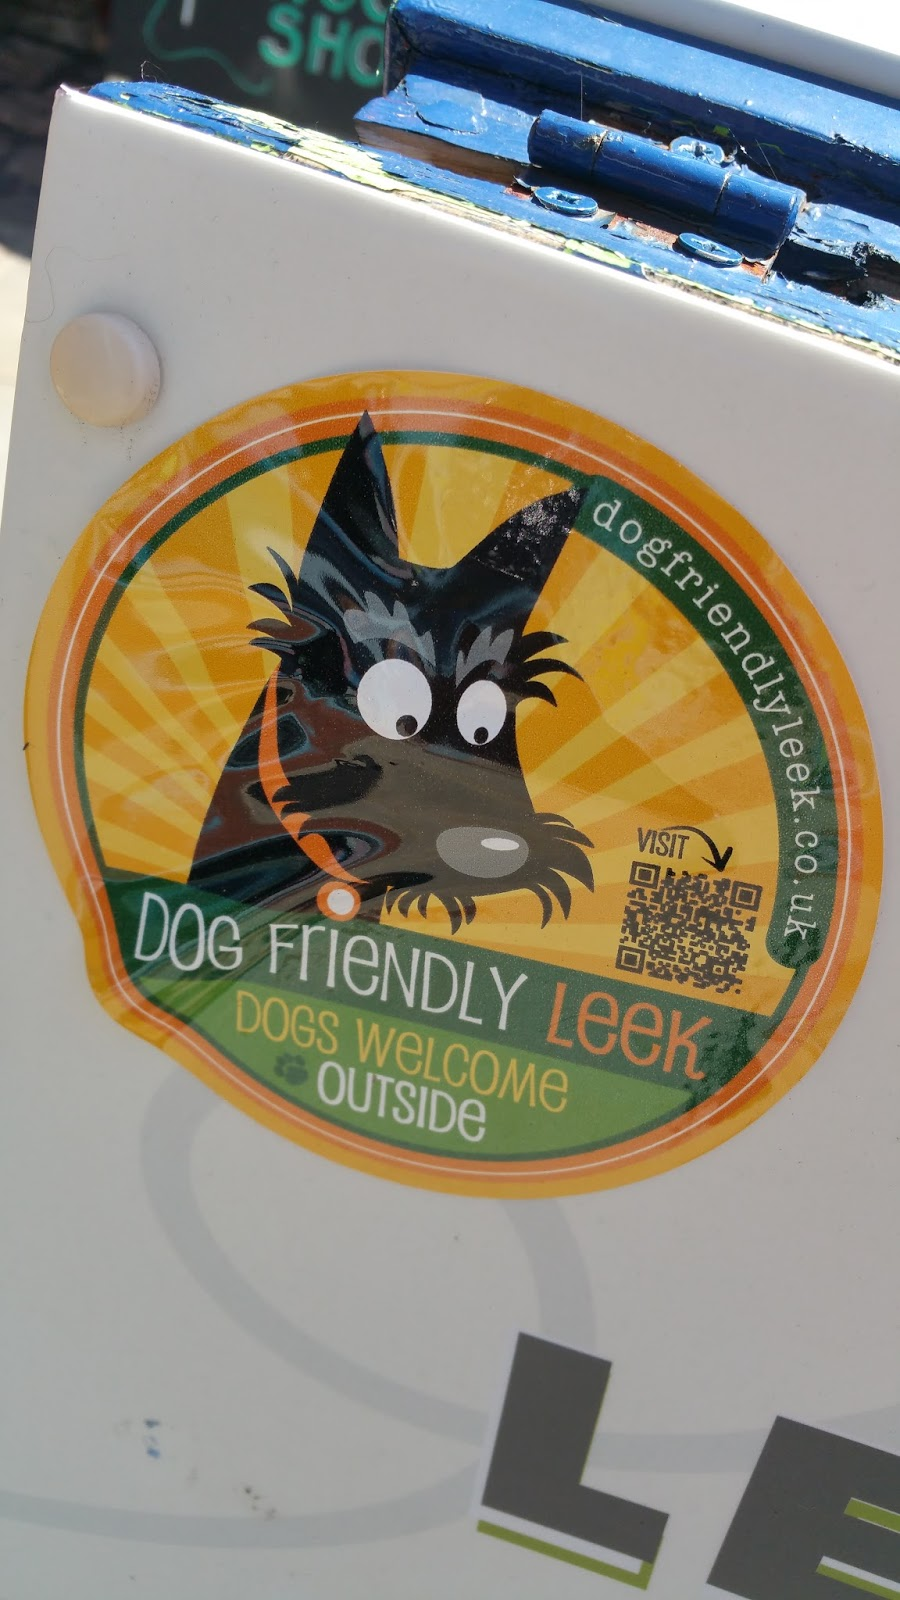 Dog Friendly Pubs Leek